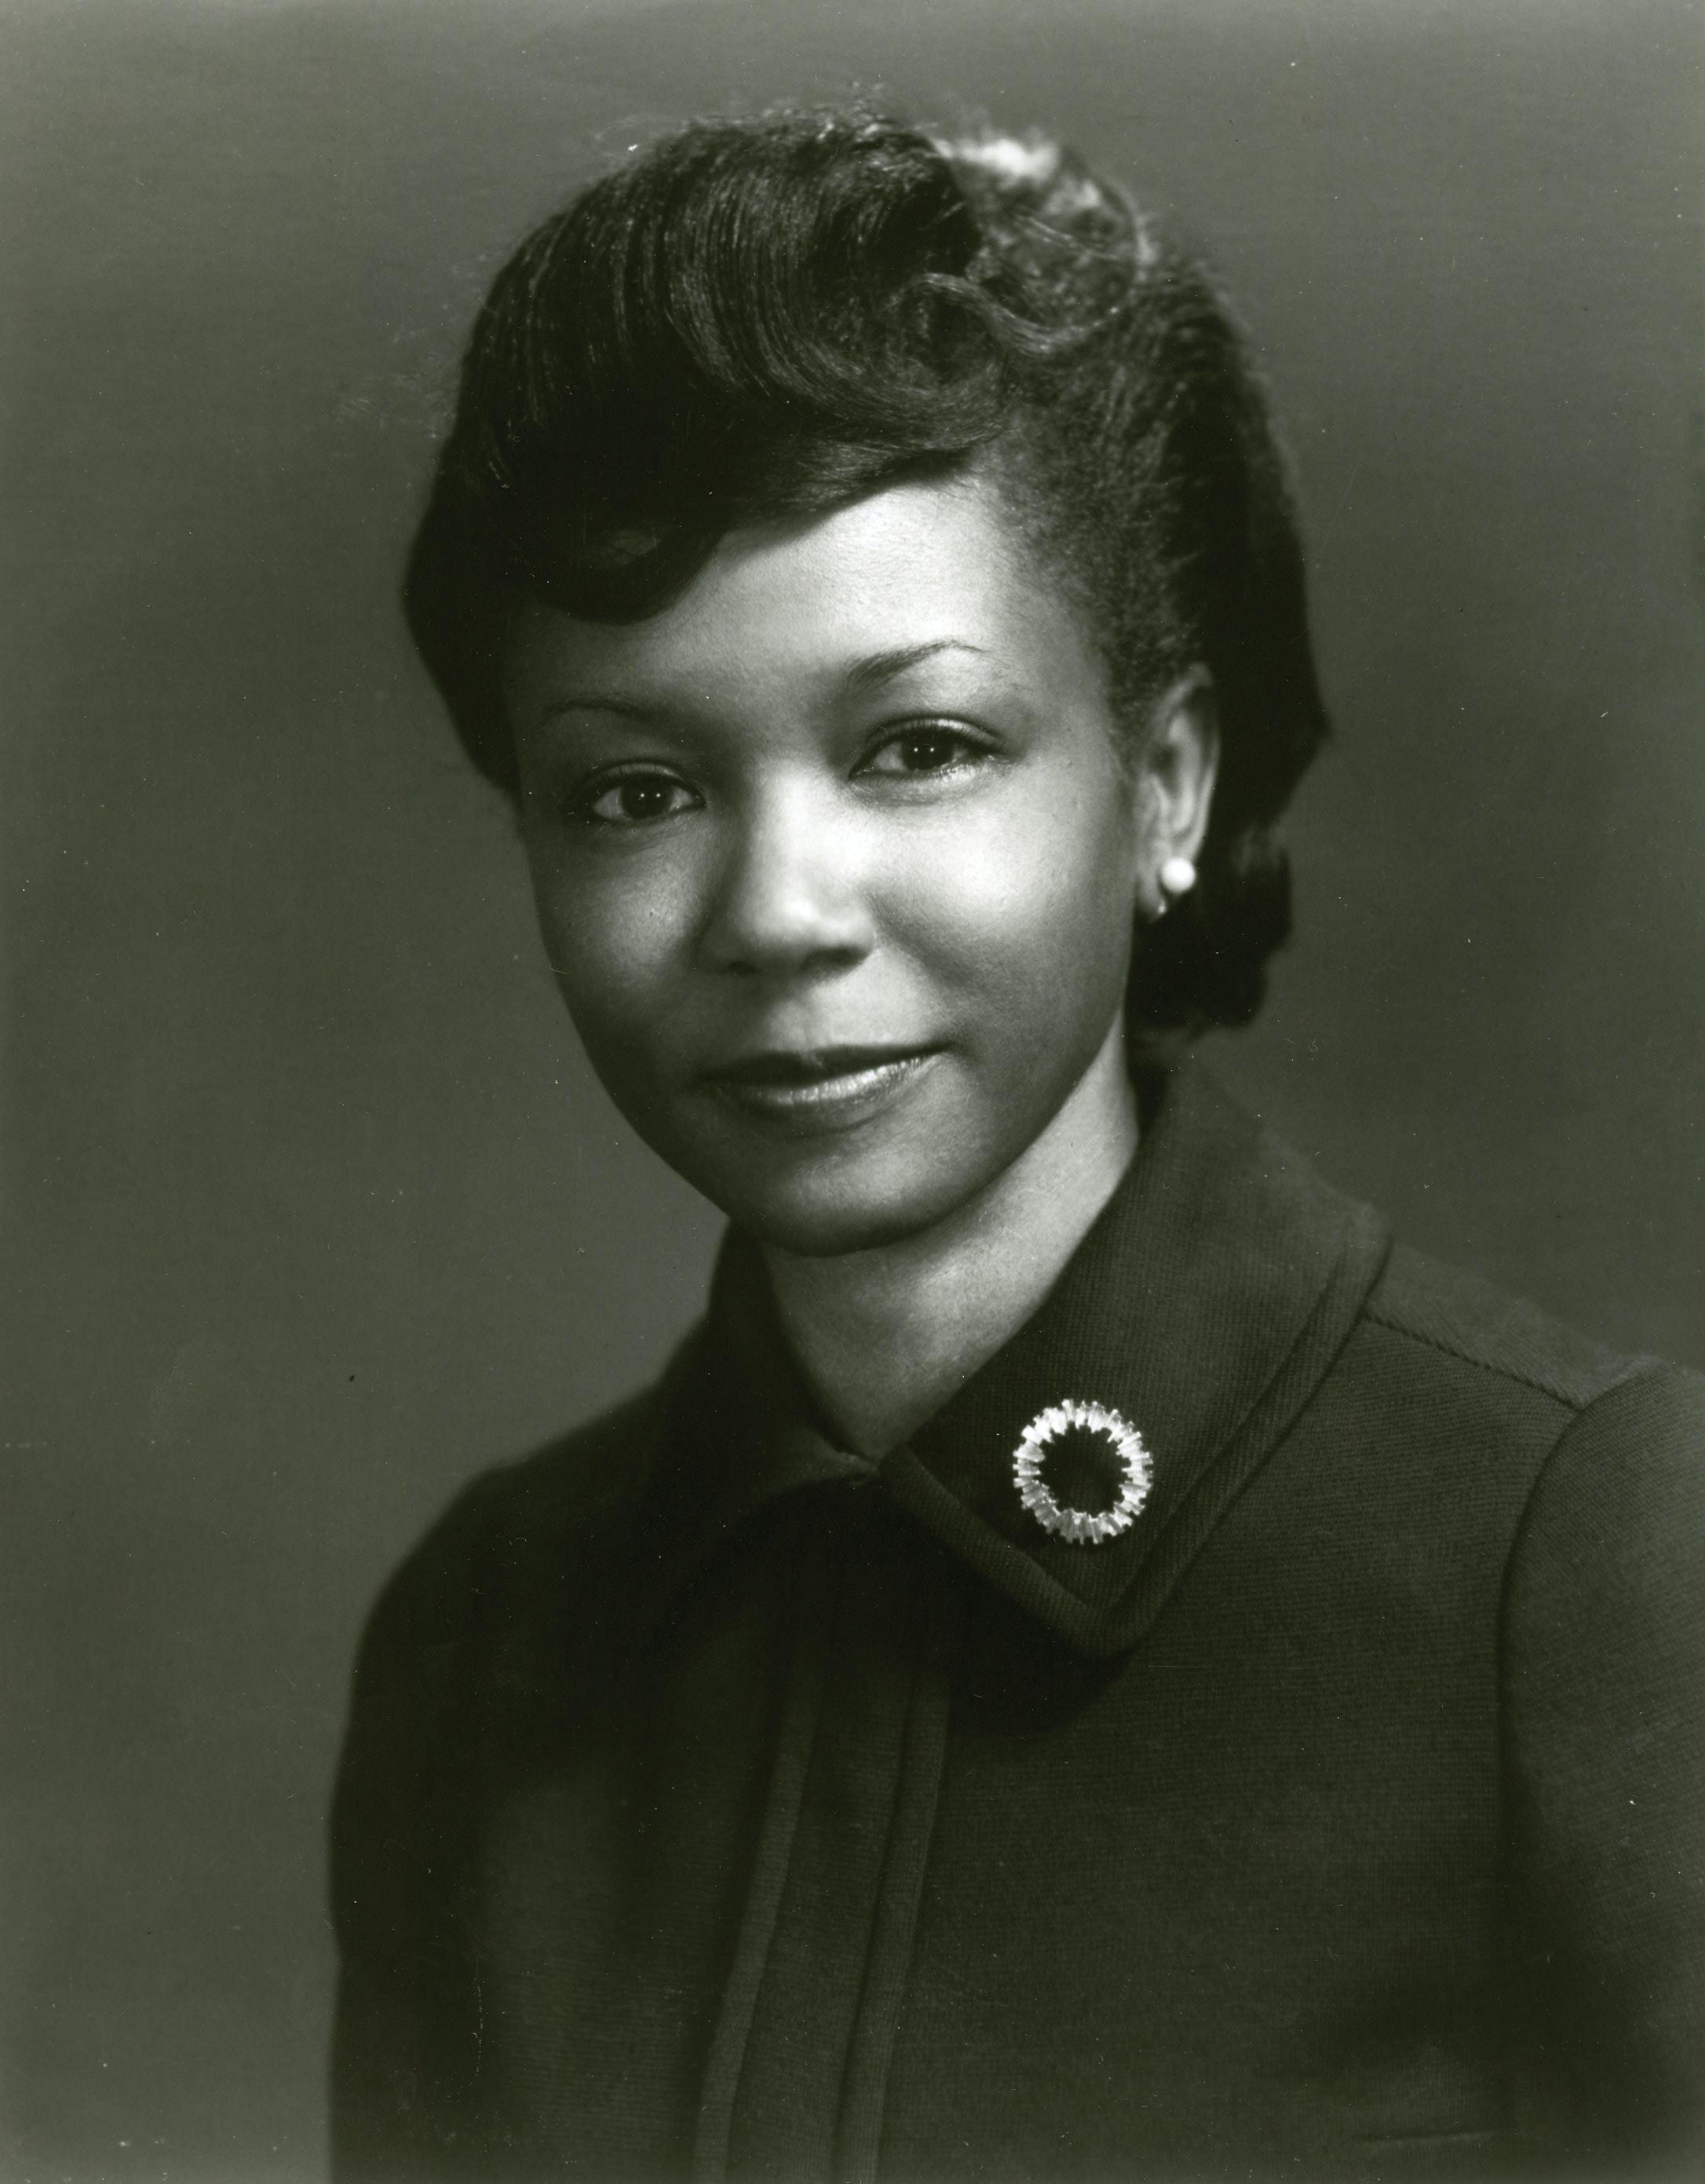 Portrait of Mildred Jefferson